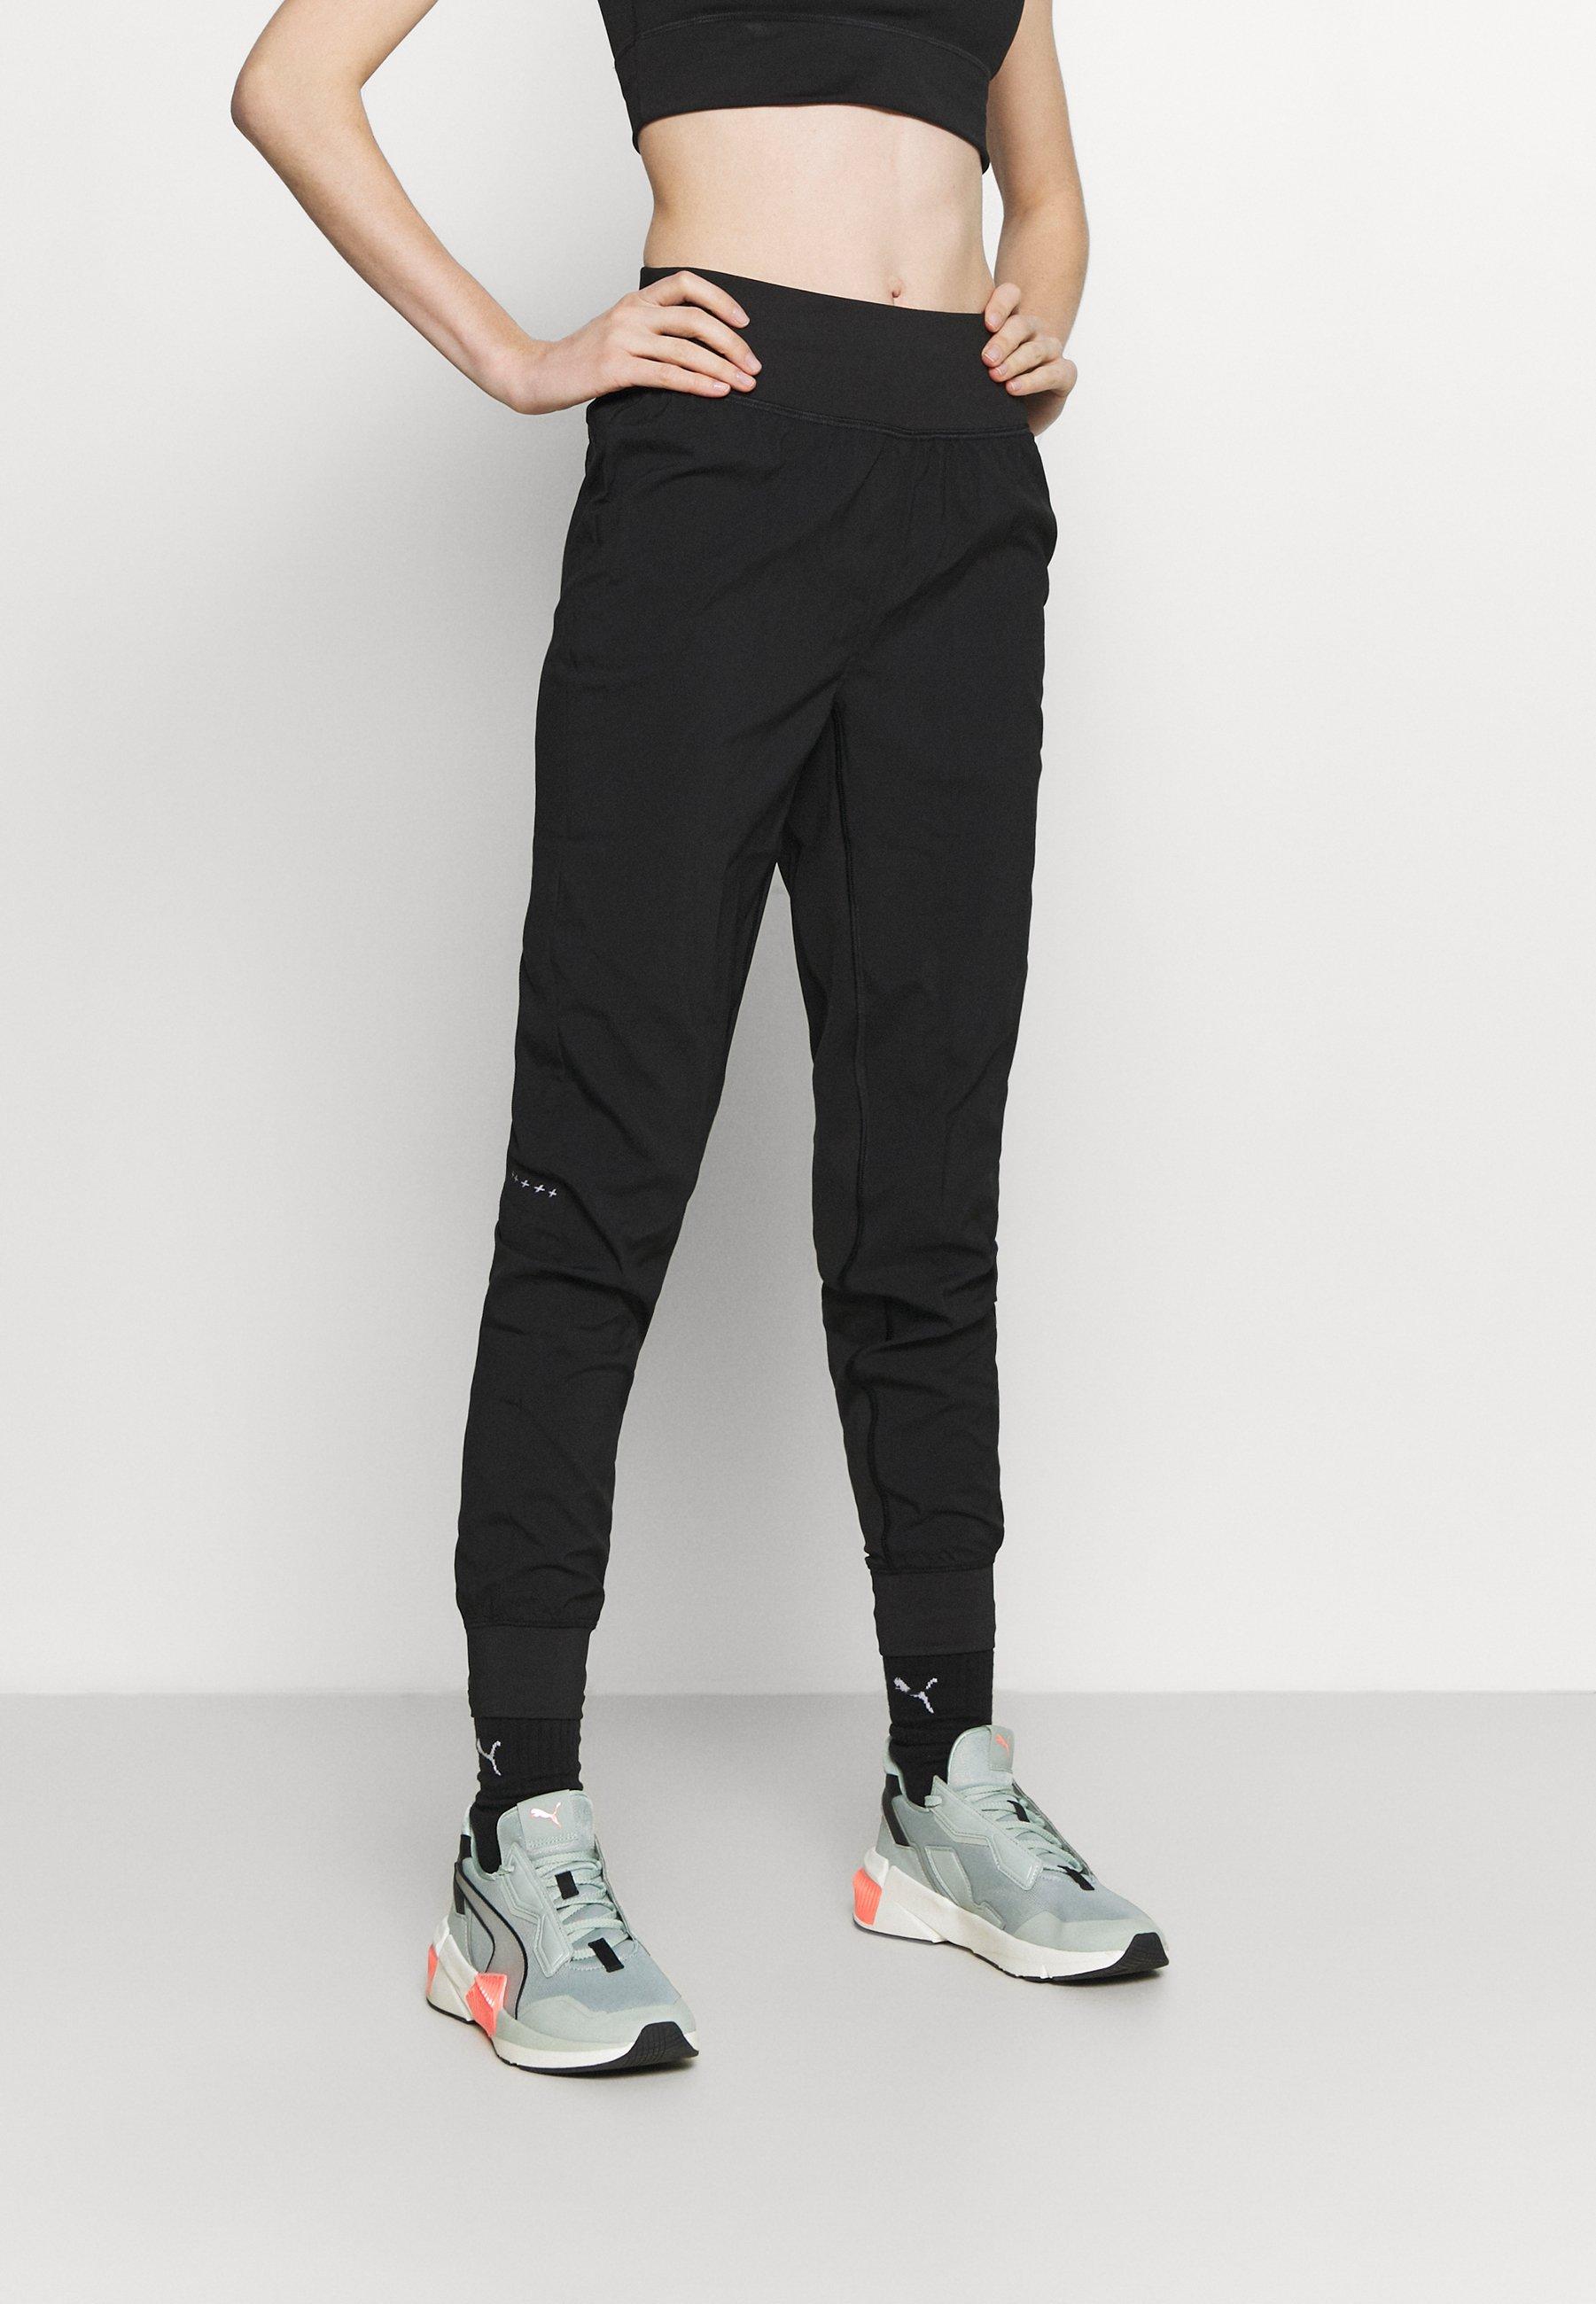 Femme RUN FAVORITE TAPERED PANT - Pantalon de survêtement